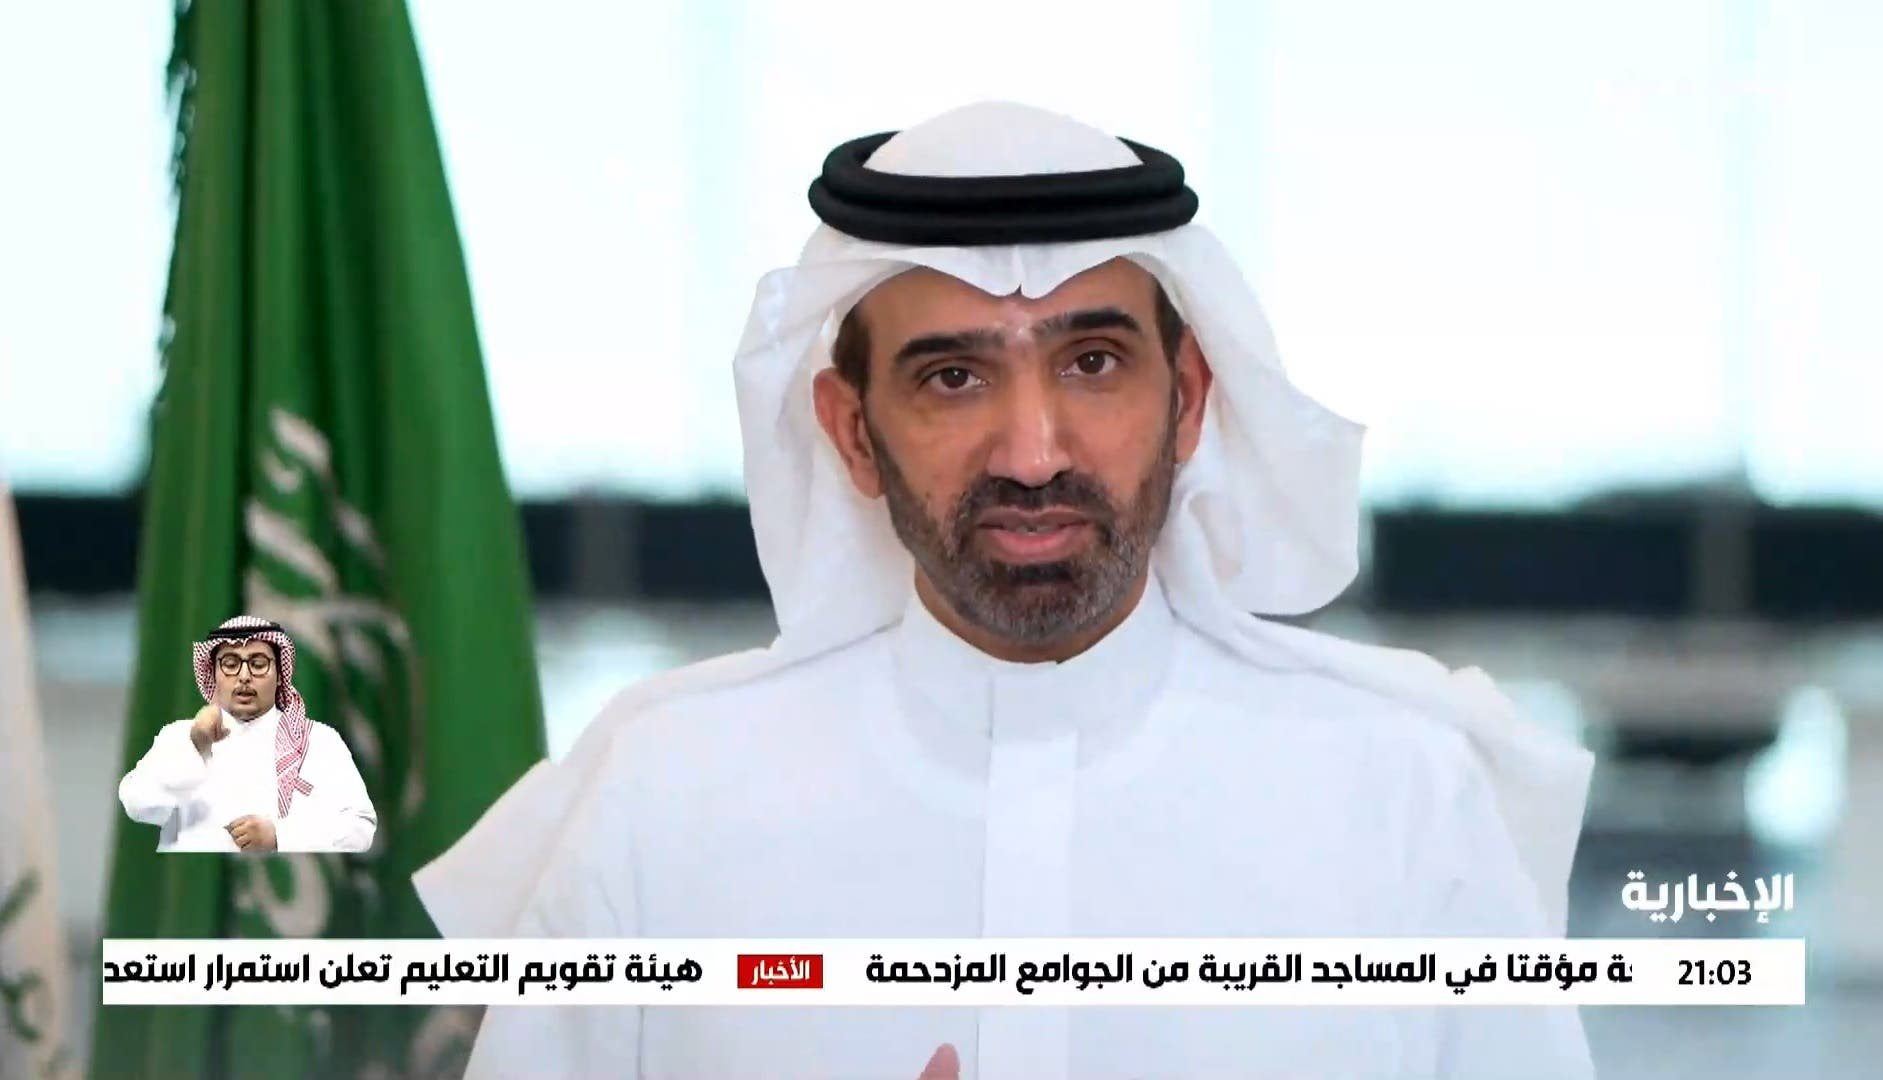 Minister of Human Resource and Social Development Ahmed bin Sulaiman Al-Rajhi. (Photo courtesy: al-Ekhbariya TV)